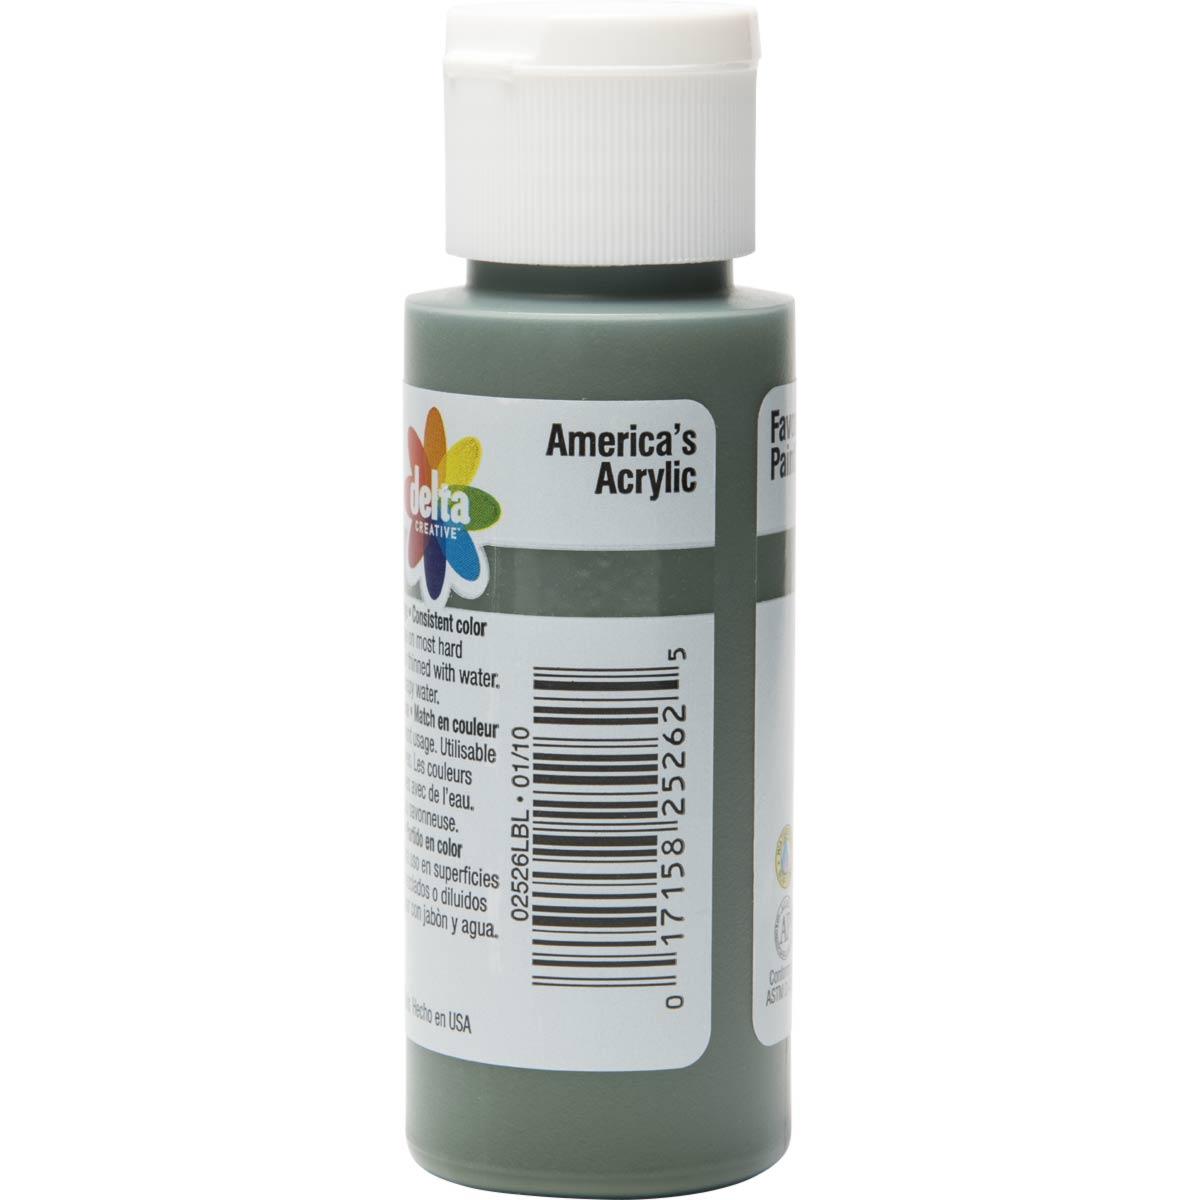 Delta Ceramcoat ® Acrylic Paint - Pine Green, 2 oz.